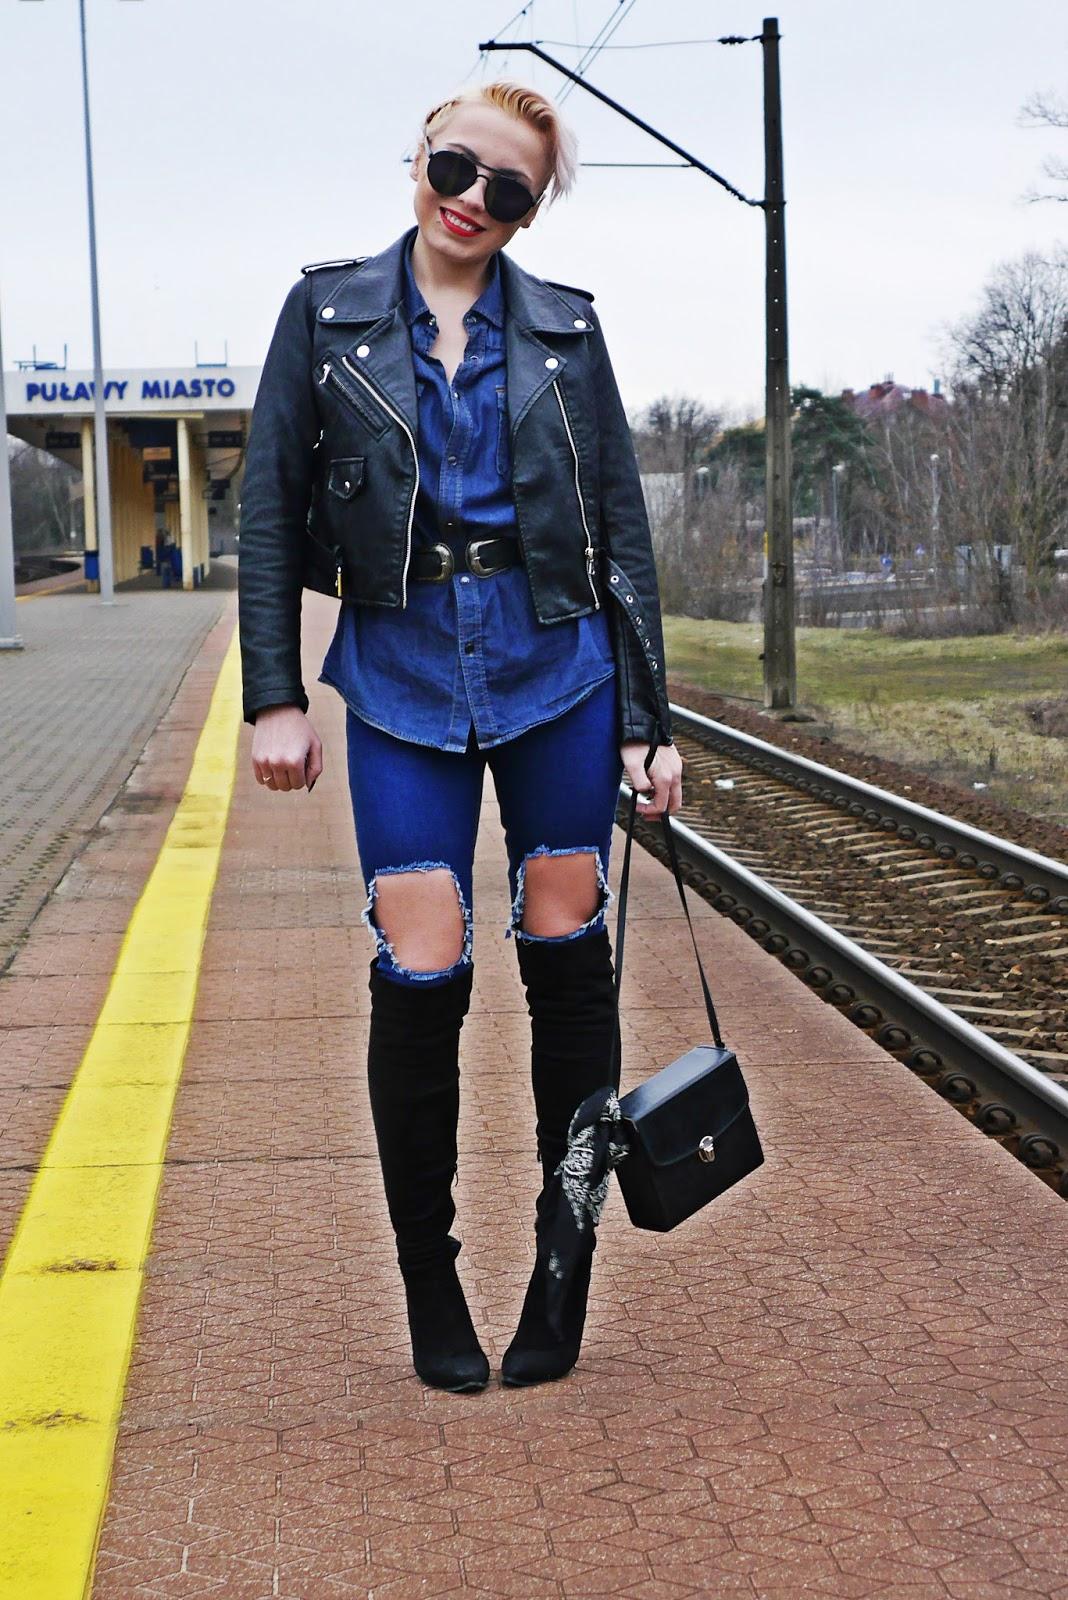 jeansowa_koszula_czarna_ramoneska_kozaki_z_kolano_karyn_look_230217c